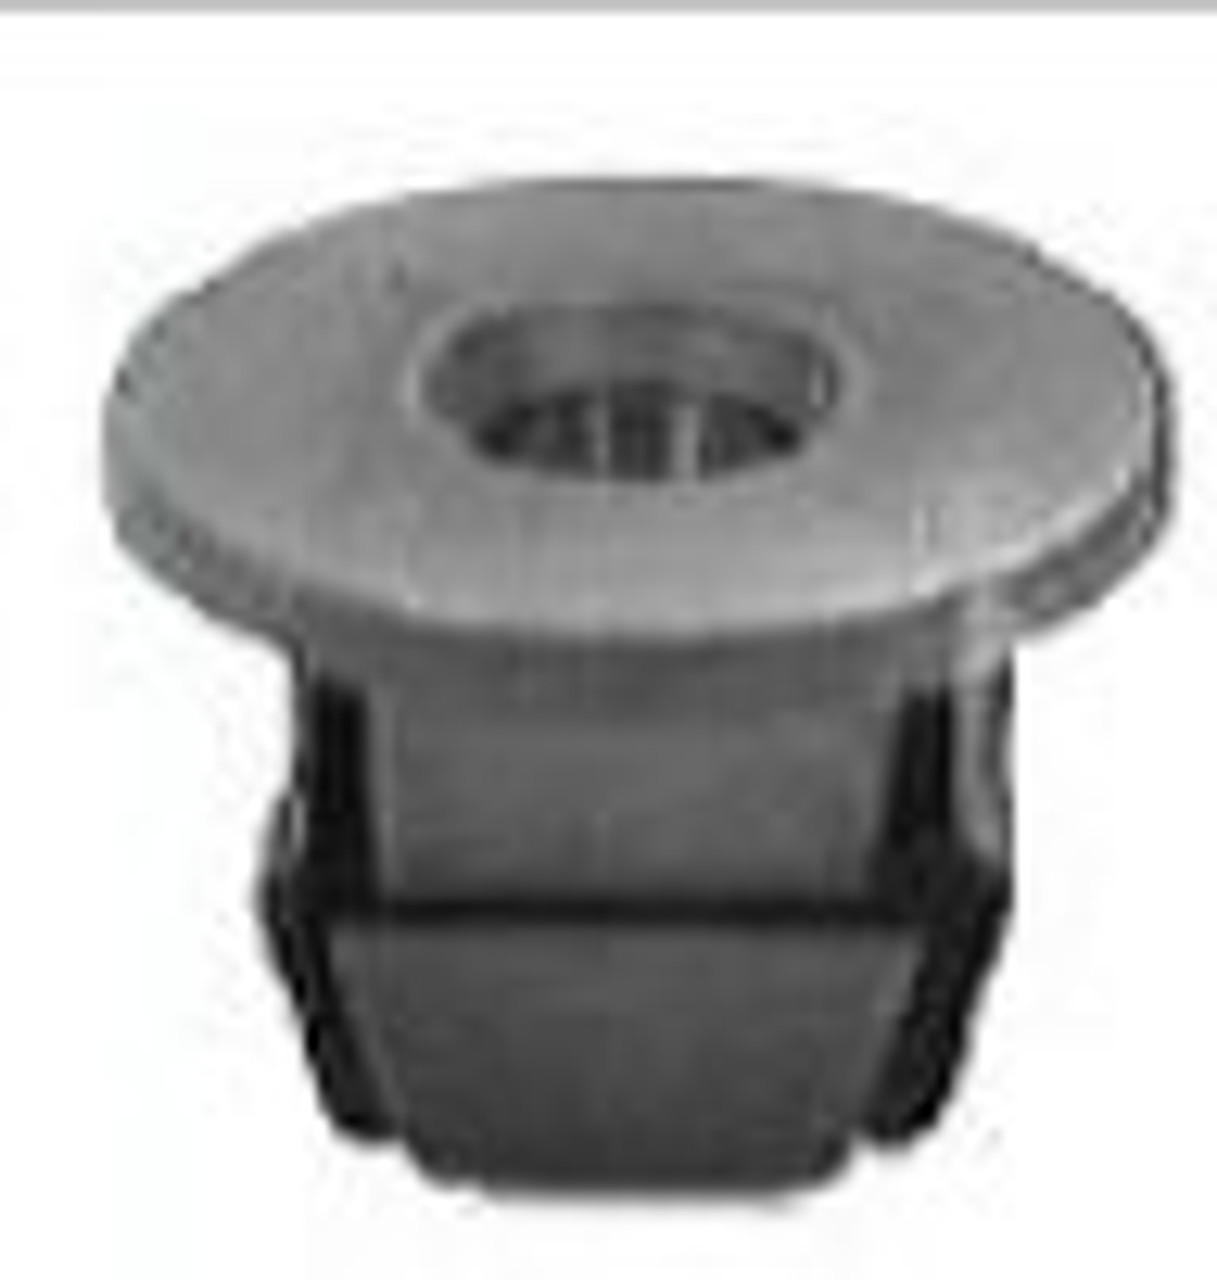 Tail Light Nut Use #8 Screw GM Astro & Safari 1985-On Volkswagon GM OEM#: 3997391 VW OEM#: 179-813-881 Black Nylon 25 Per Box Click Next Image For Clip Detail